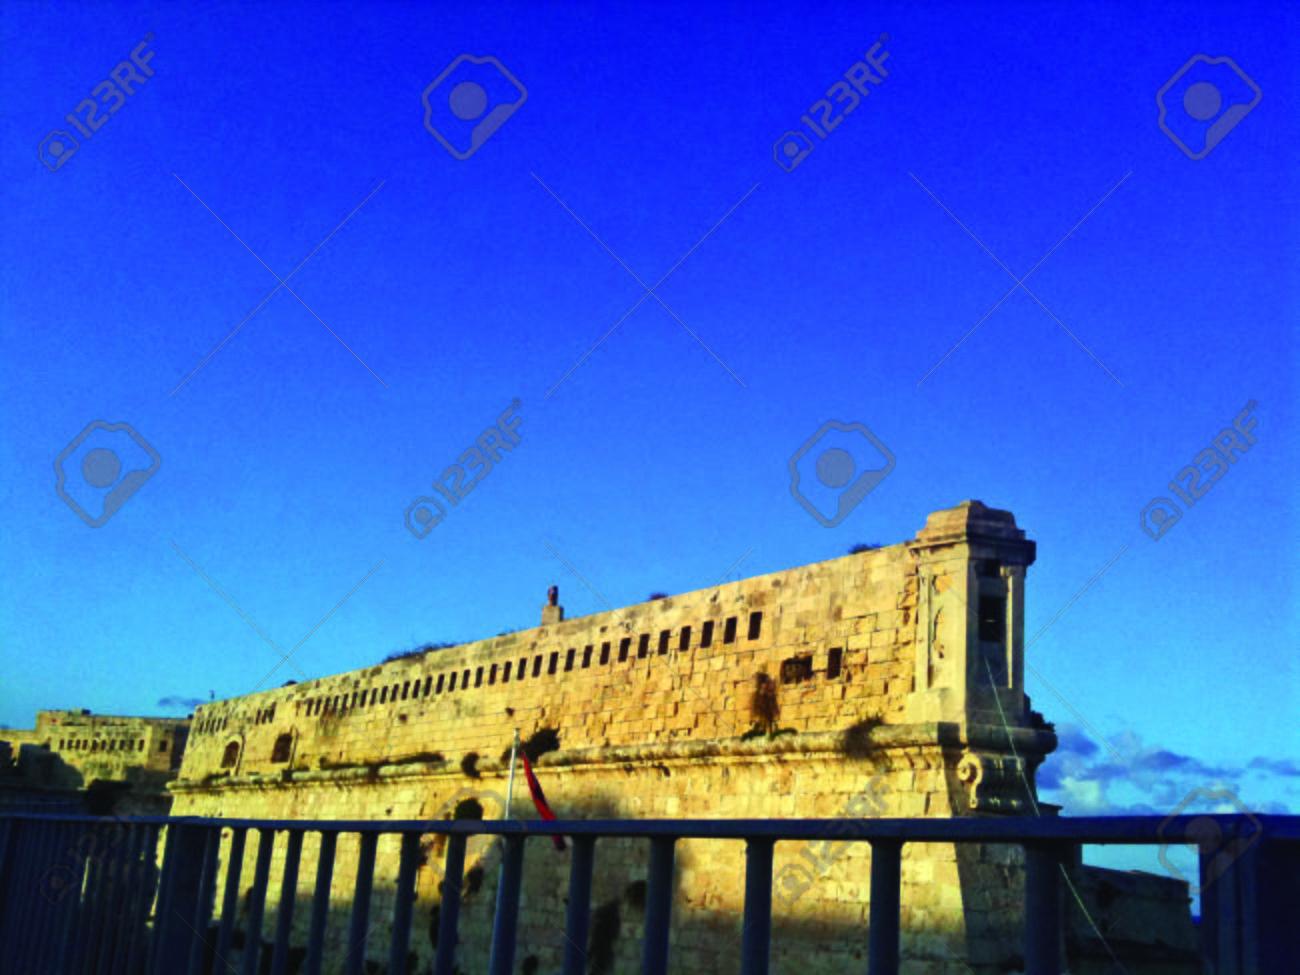 Maltese Fortress Wall - 34359899